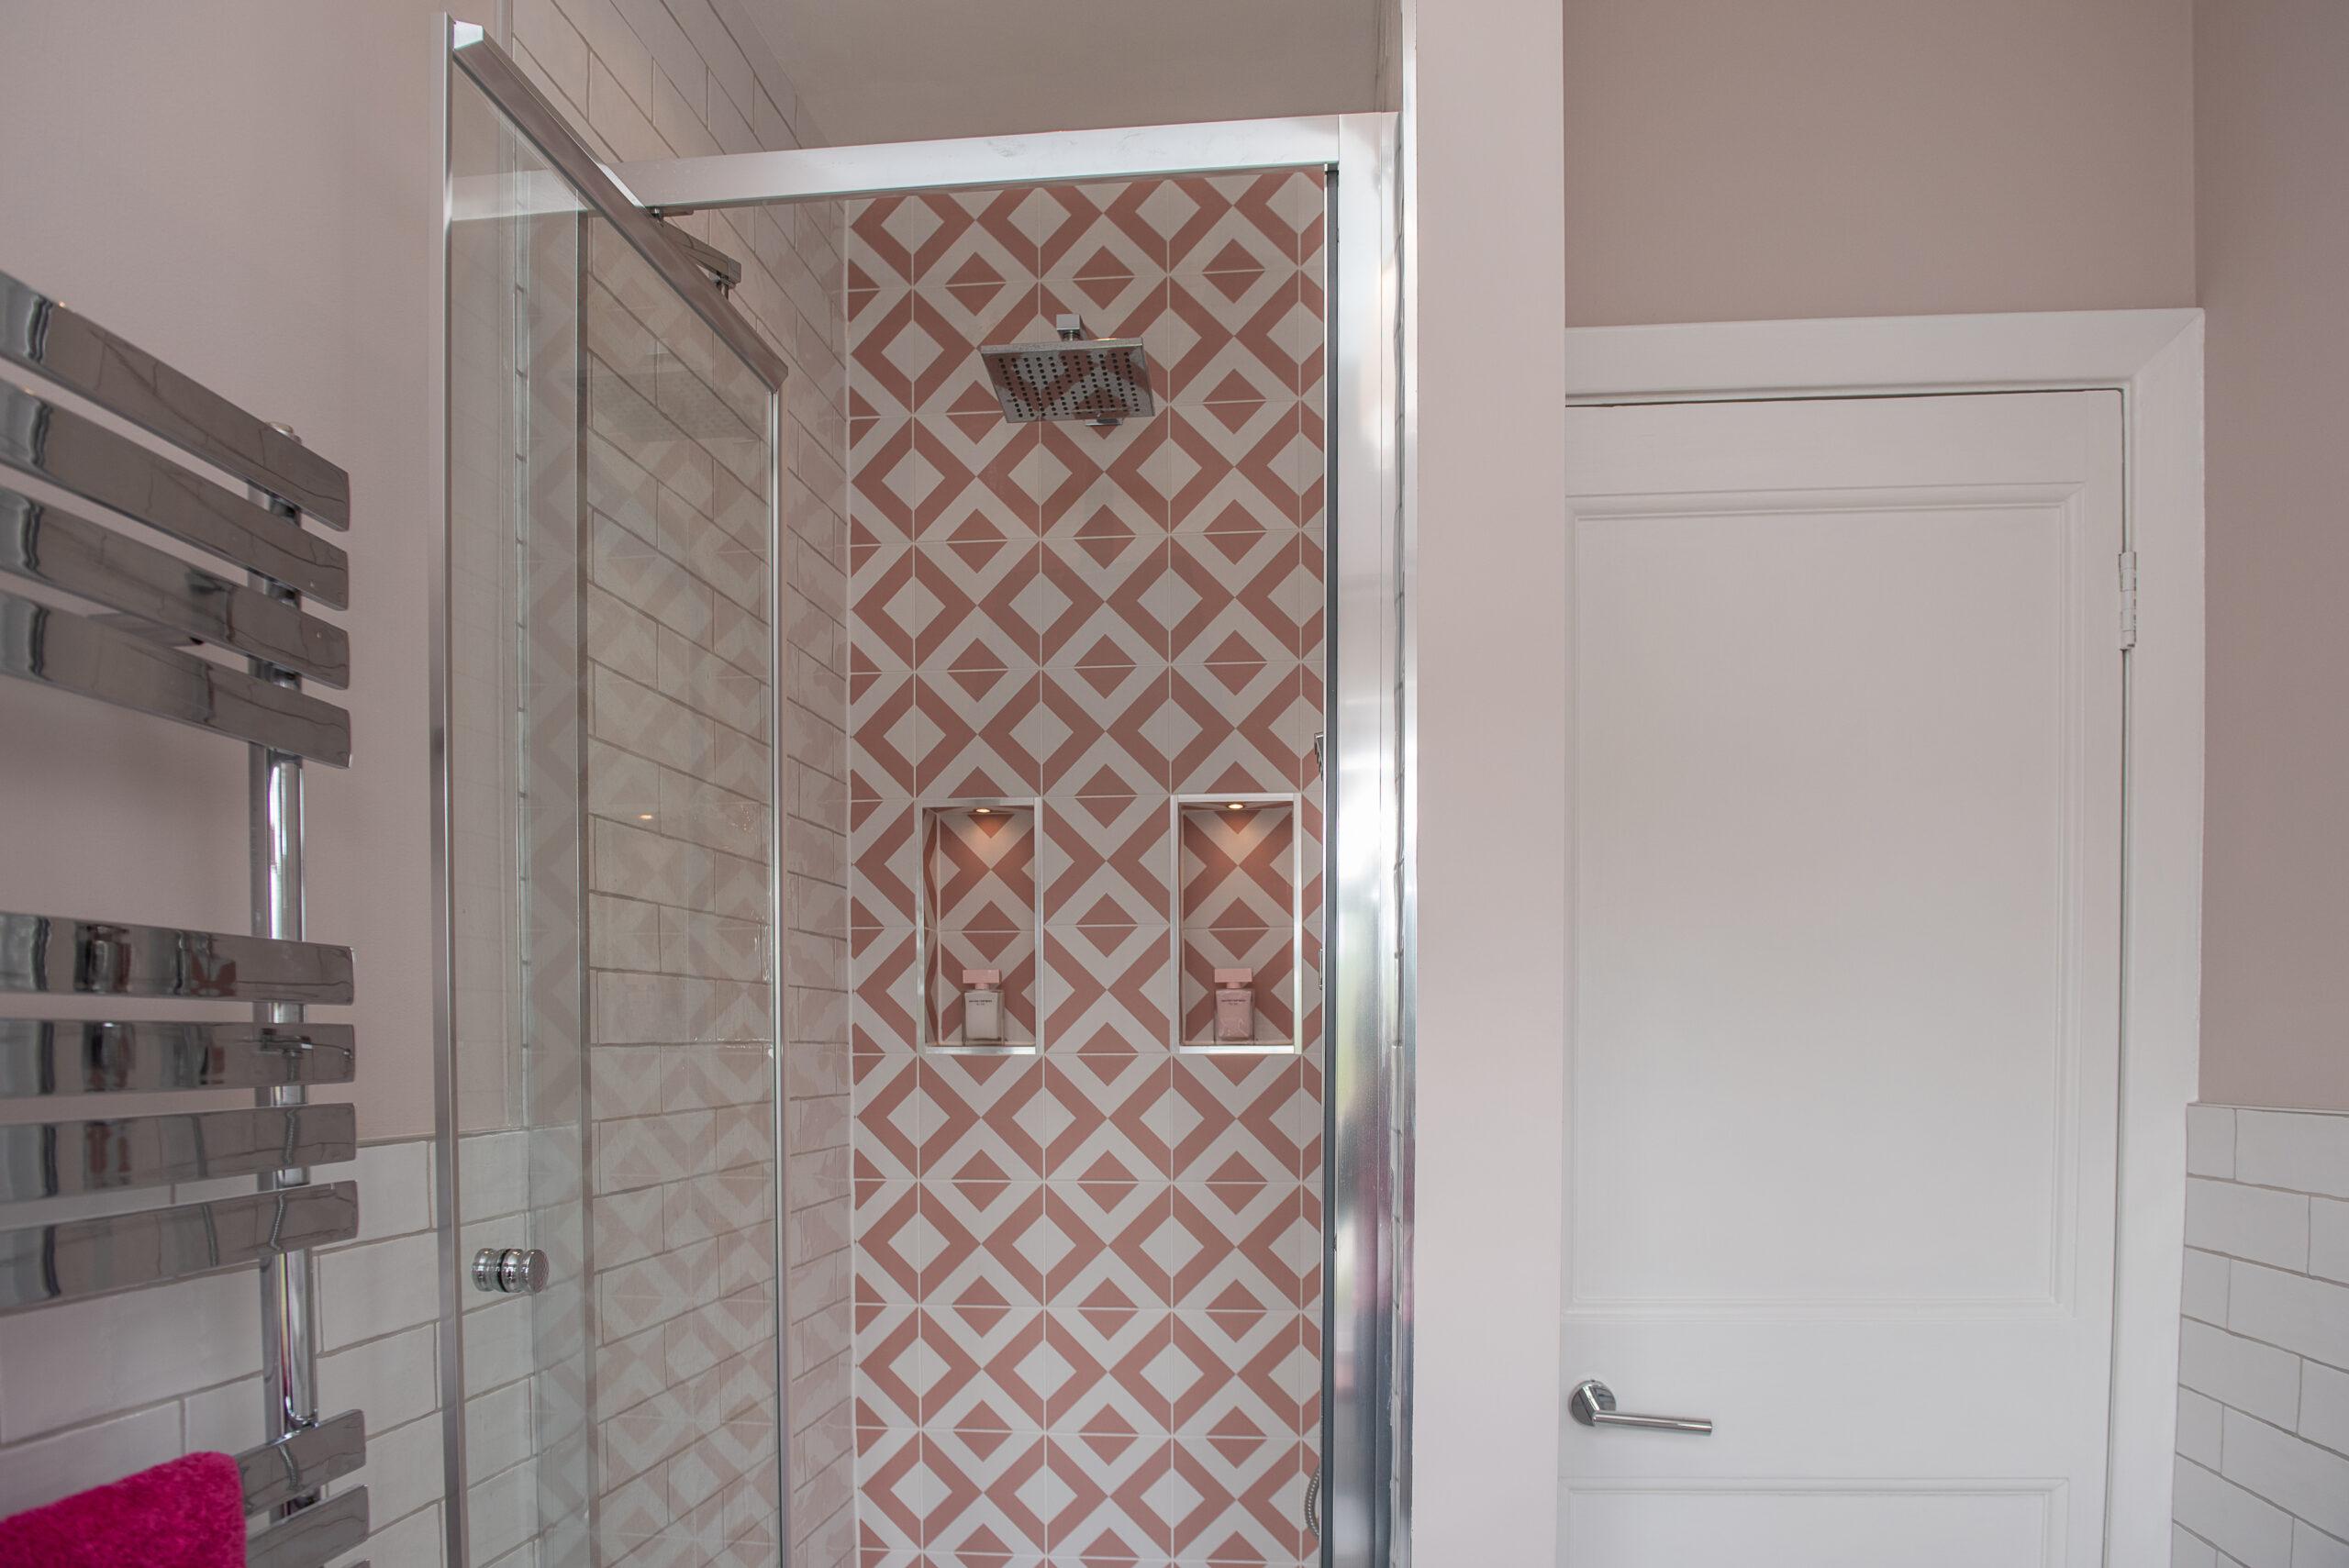 Fairways Goring Ensuite Bathroom Dual Shower Rainfall